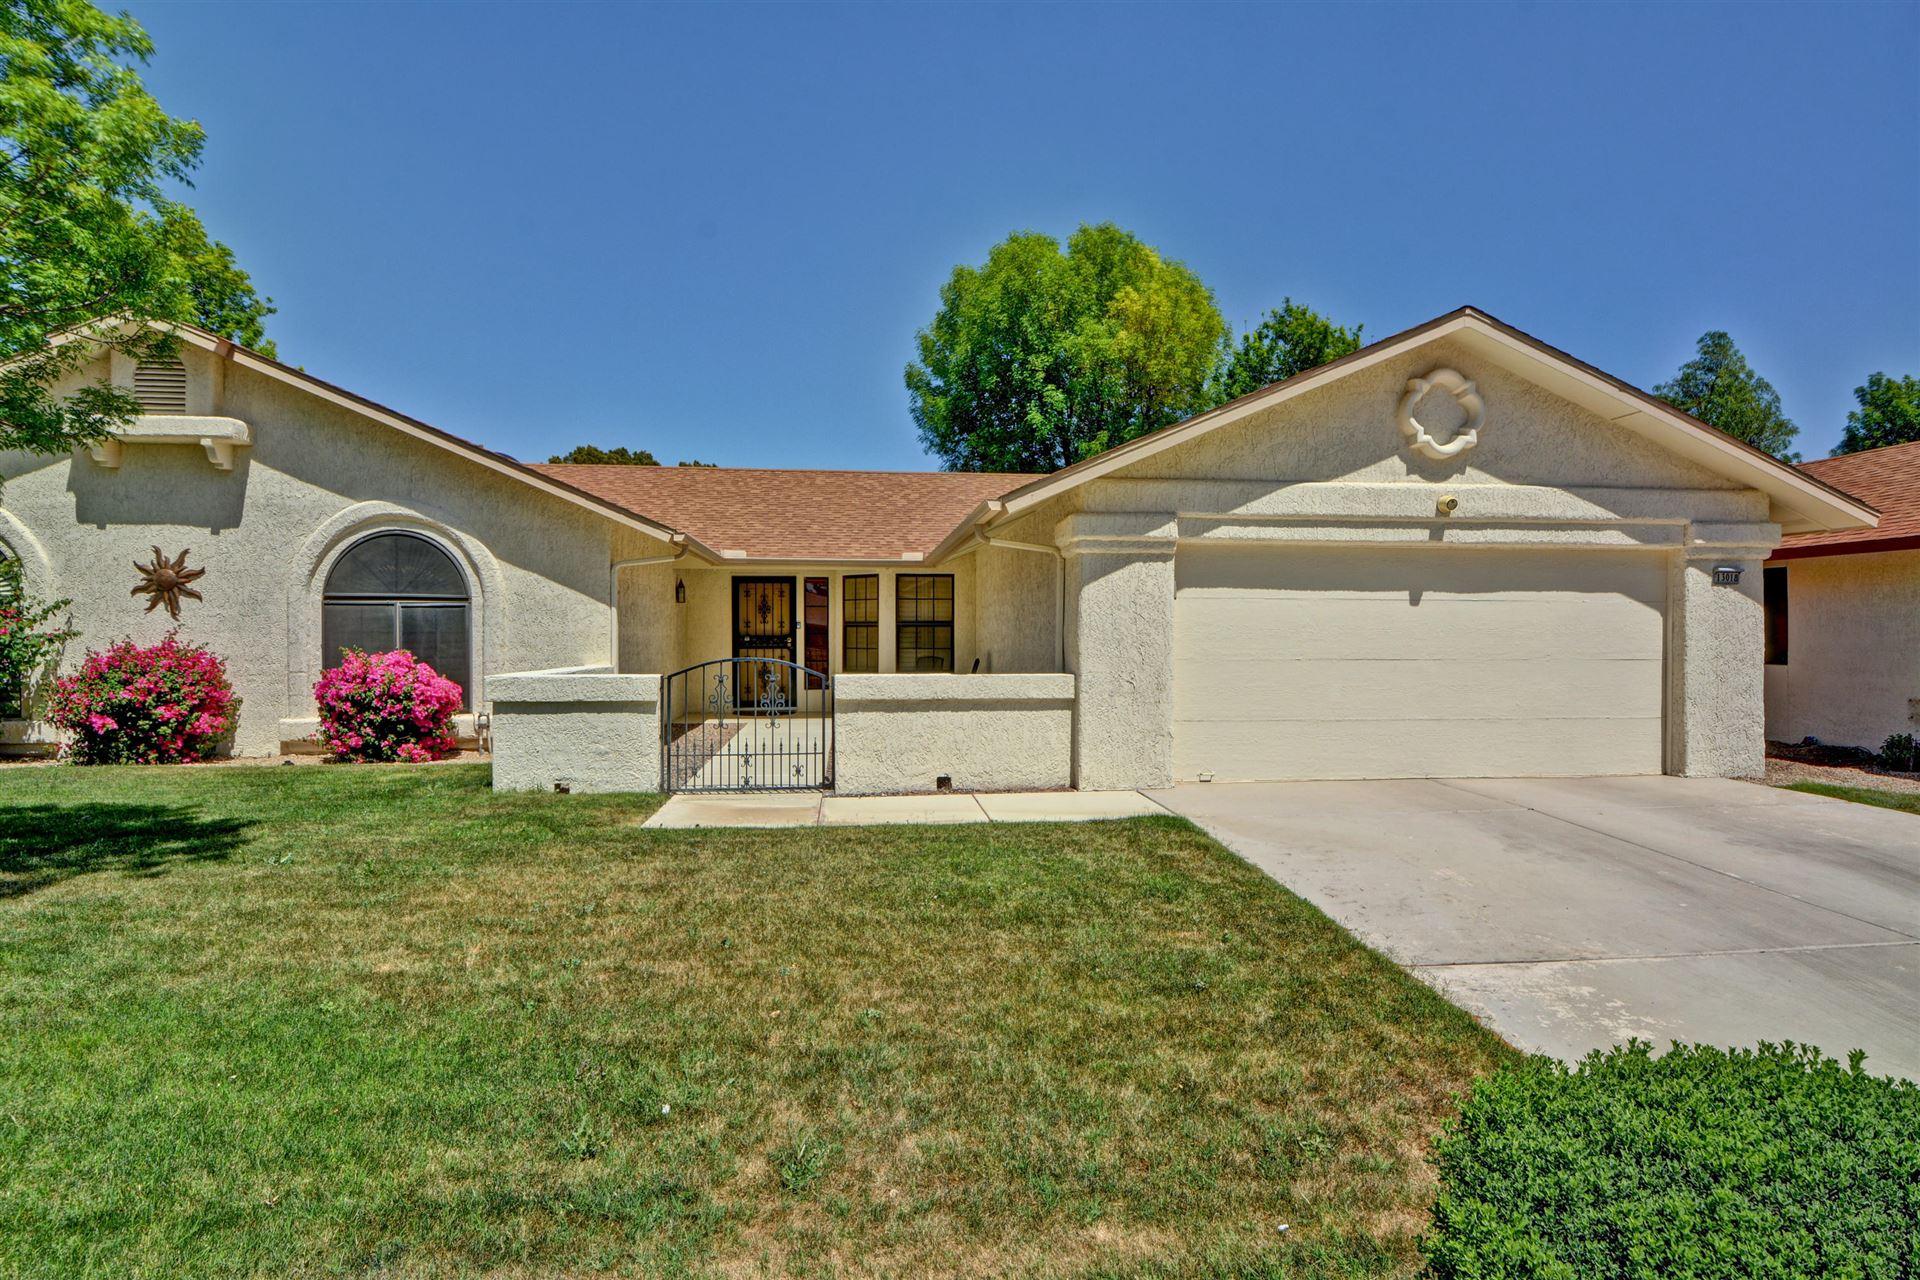 Photo of 13018 W BLUE SKY Drive, Sun City West, AZ 85375 (MLS # 6221479)